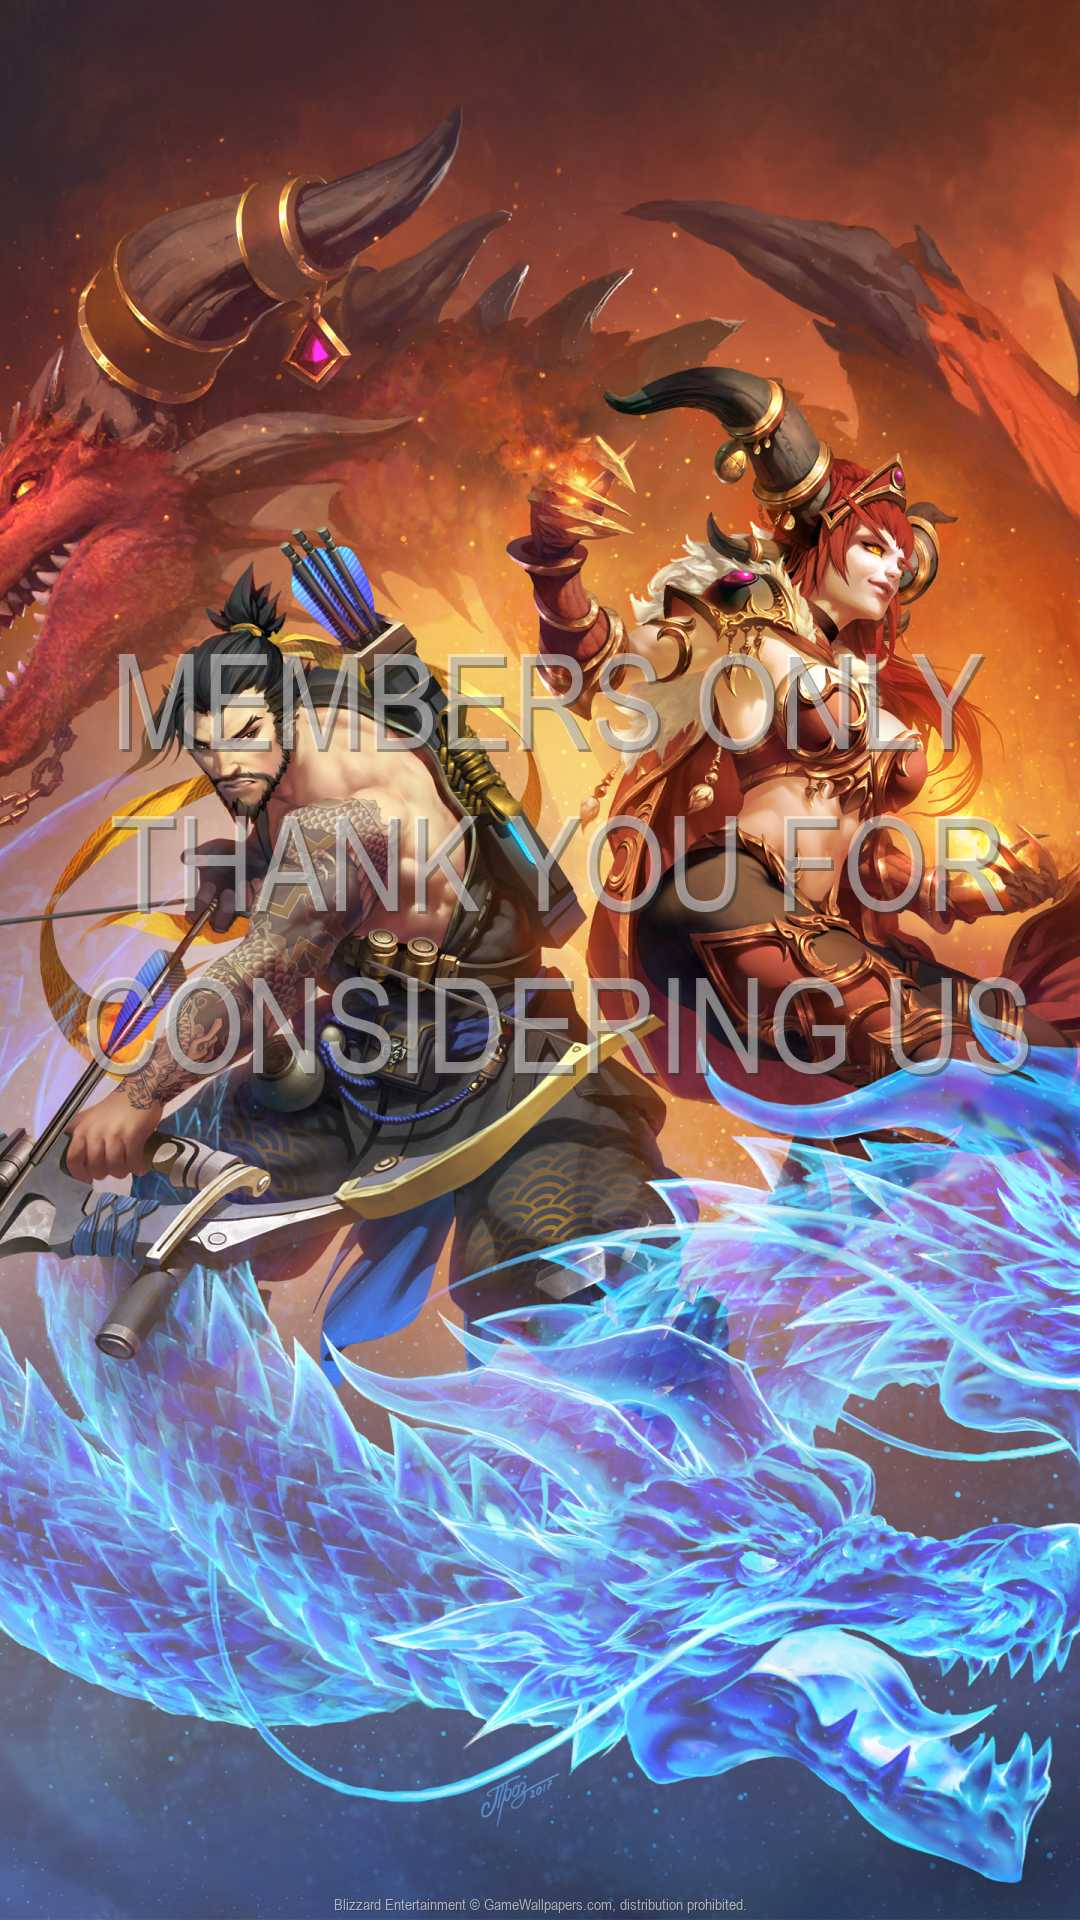 Blizzard Entertainment 1080p Vertical Mobile wallpaper or background 04